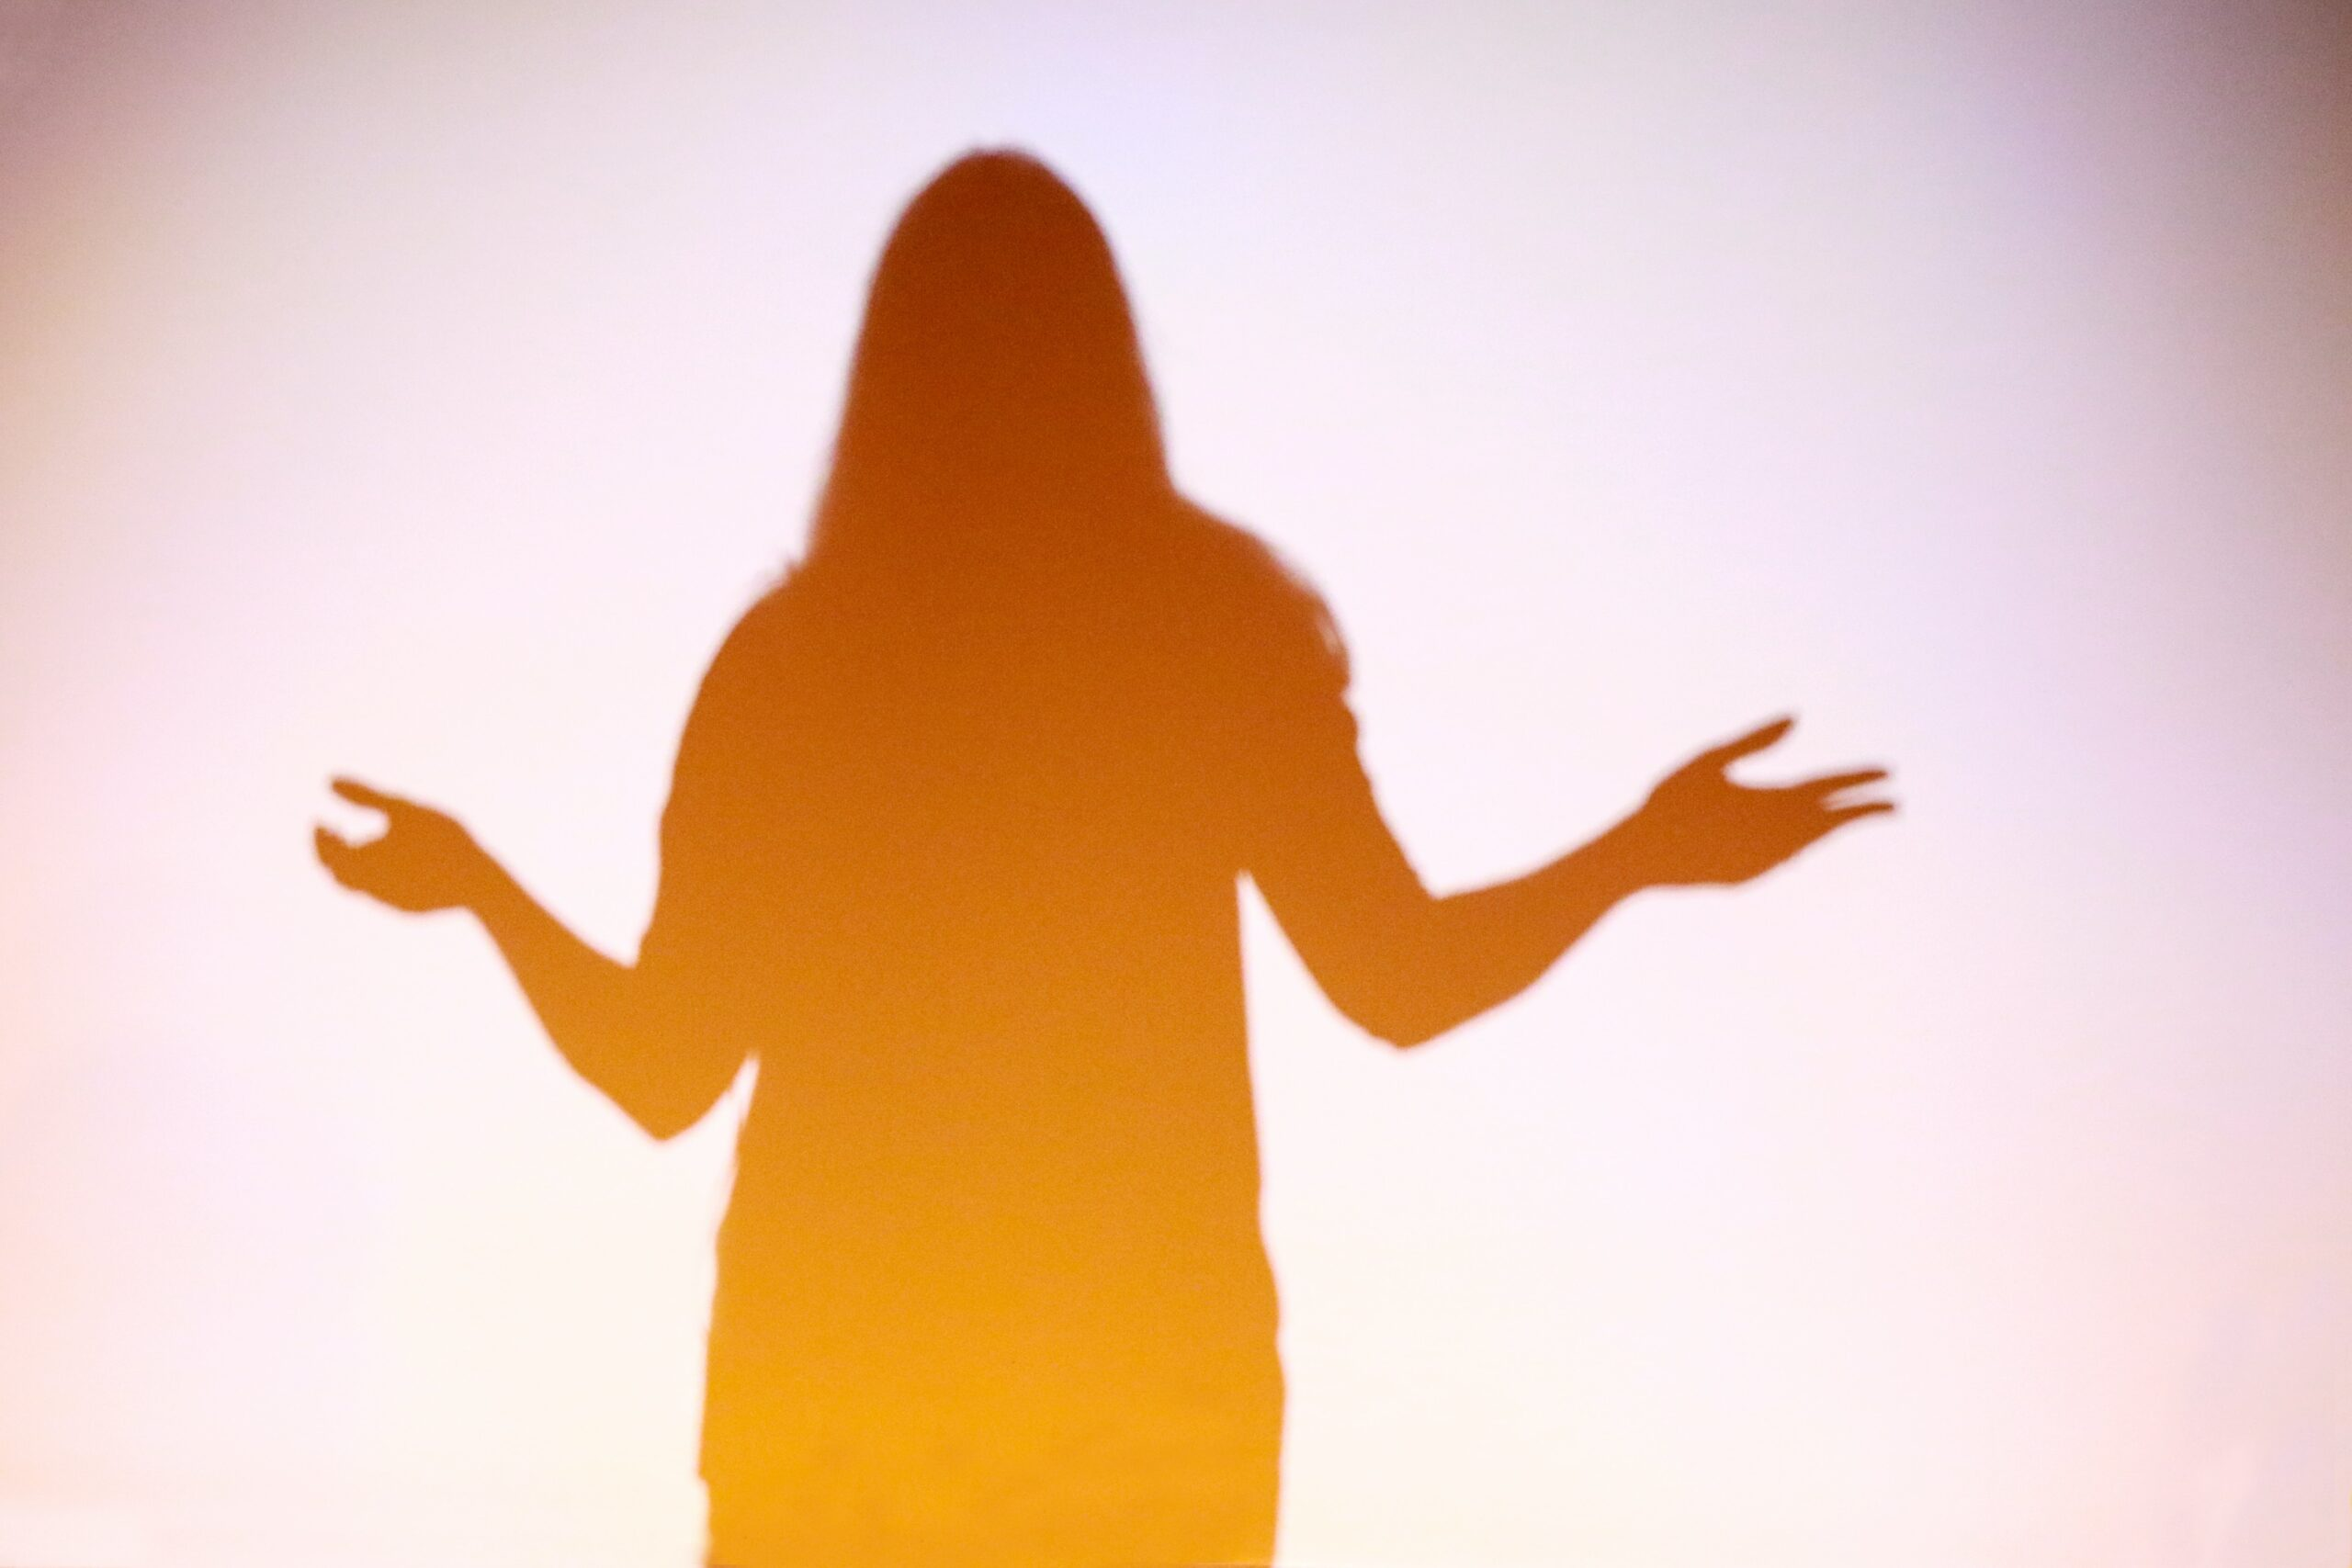 Shadow of a women